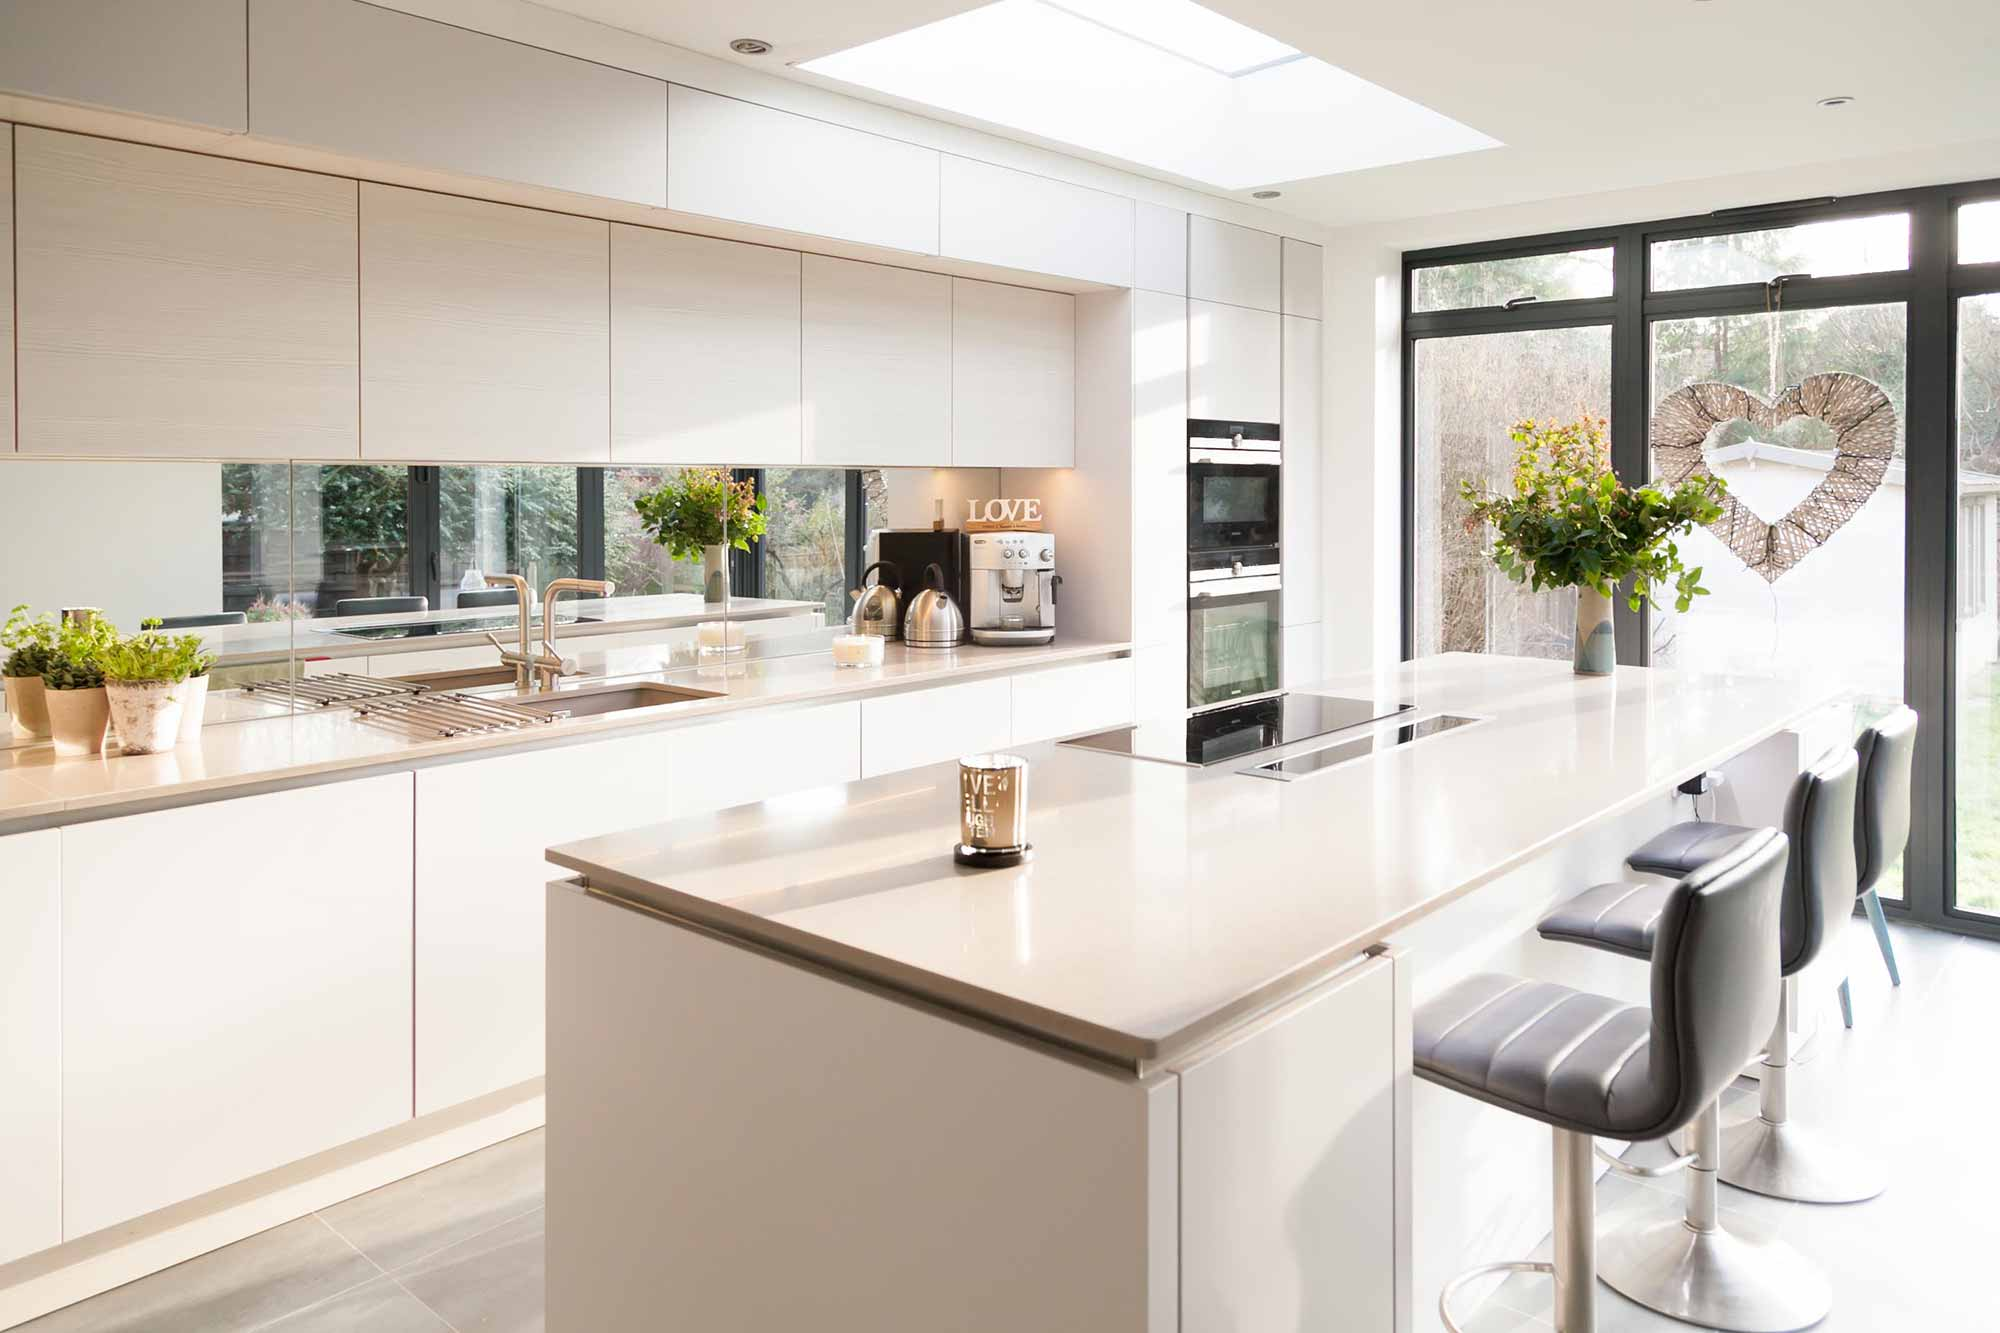 charlton kings kitchen project kitchens cirencester voga. Black Bedroom Furniture Sets. Home Design Ideas